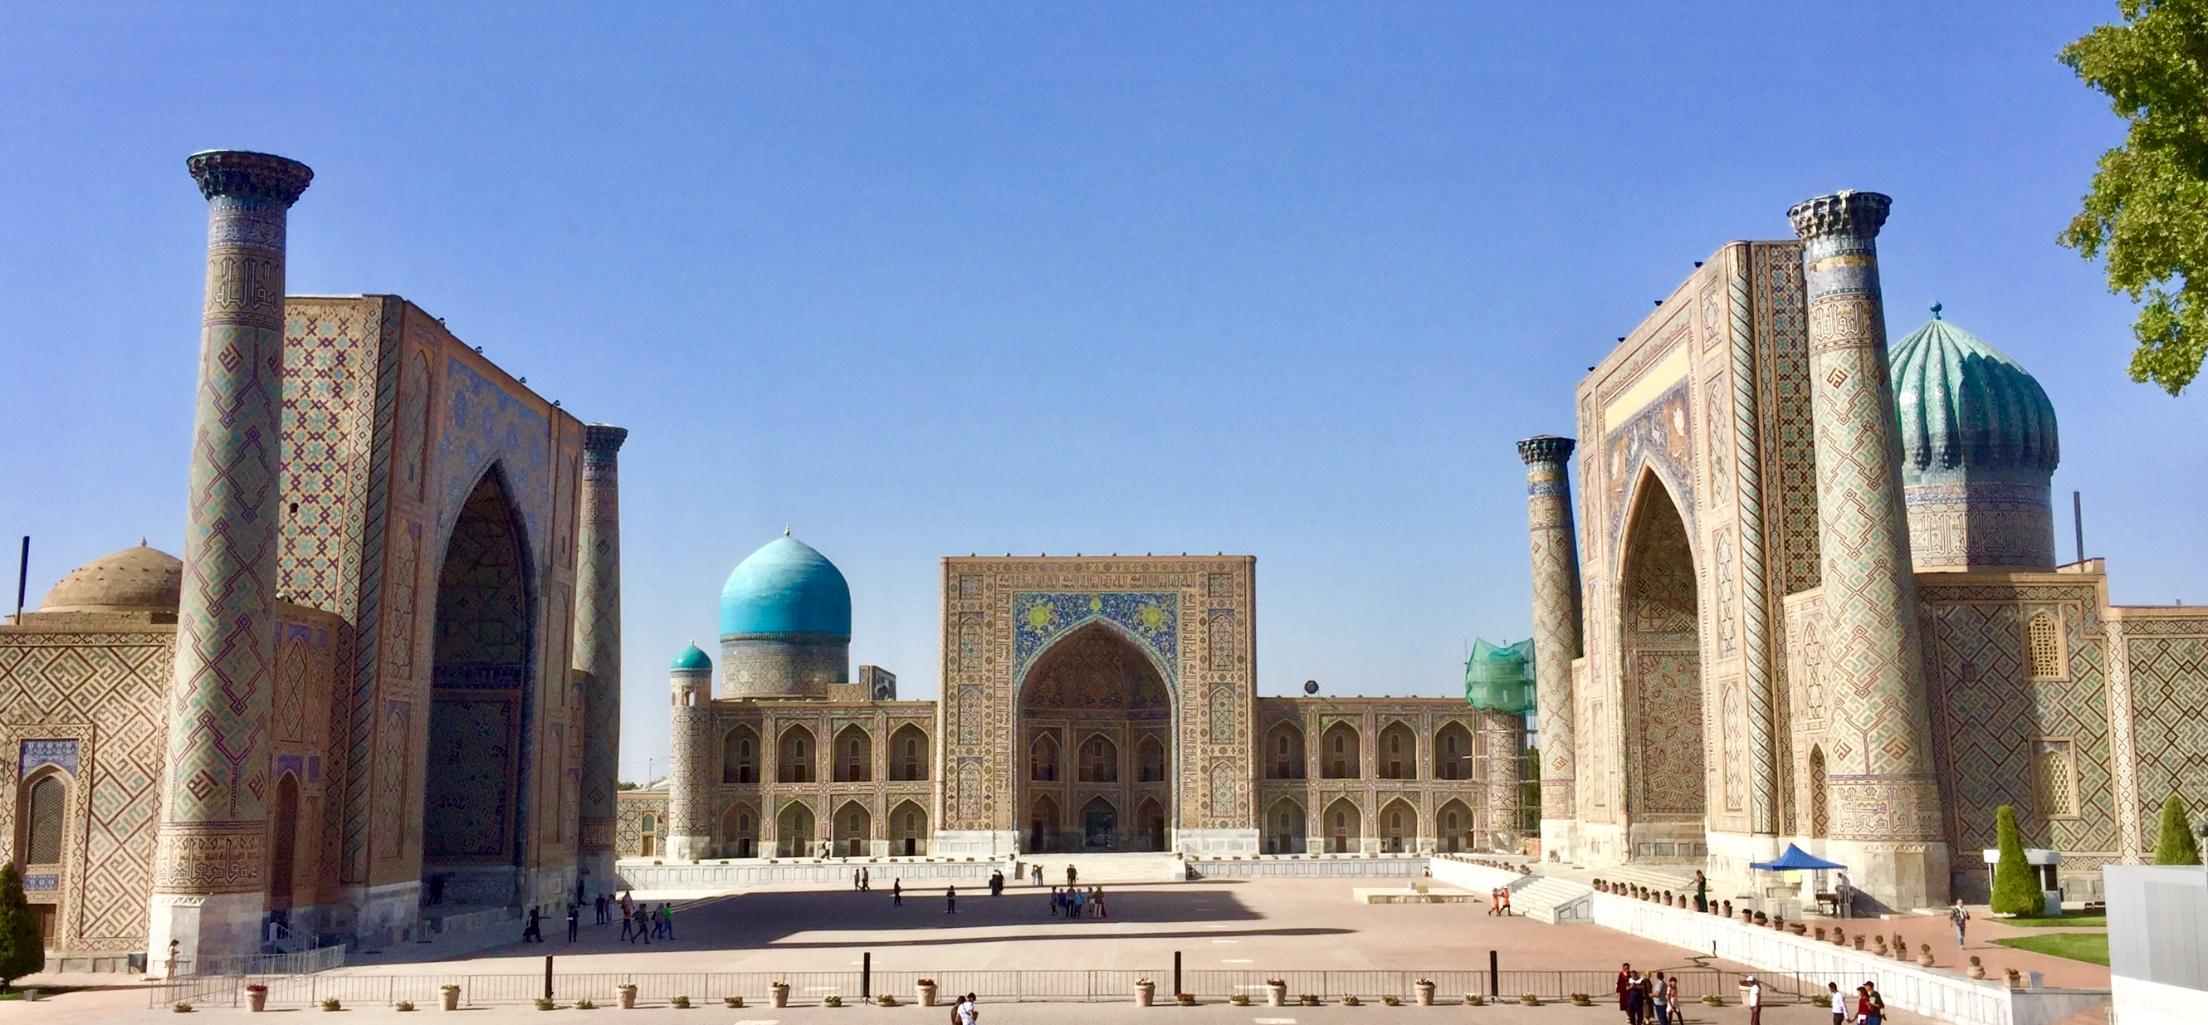 The Registan Samarkand